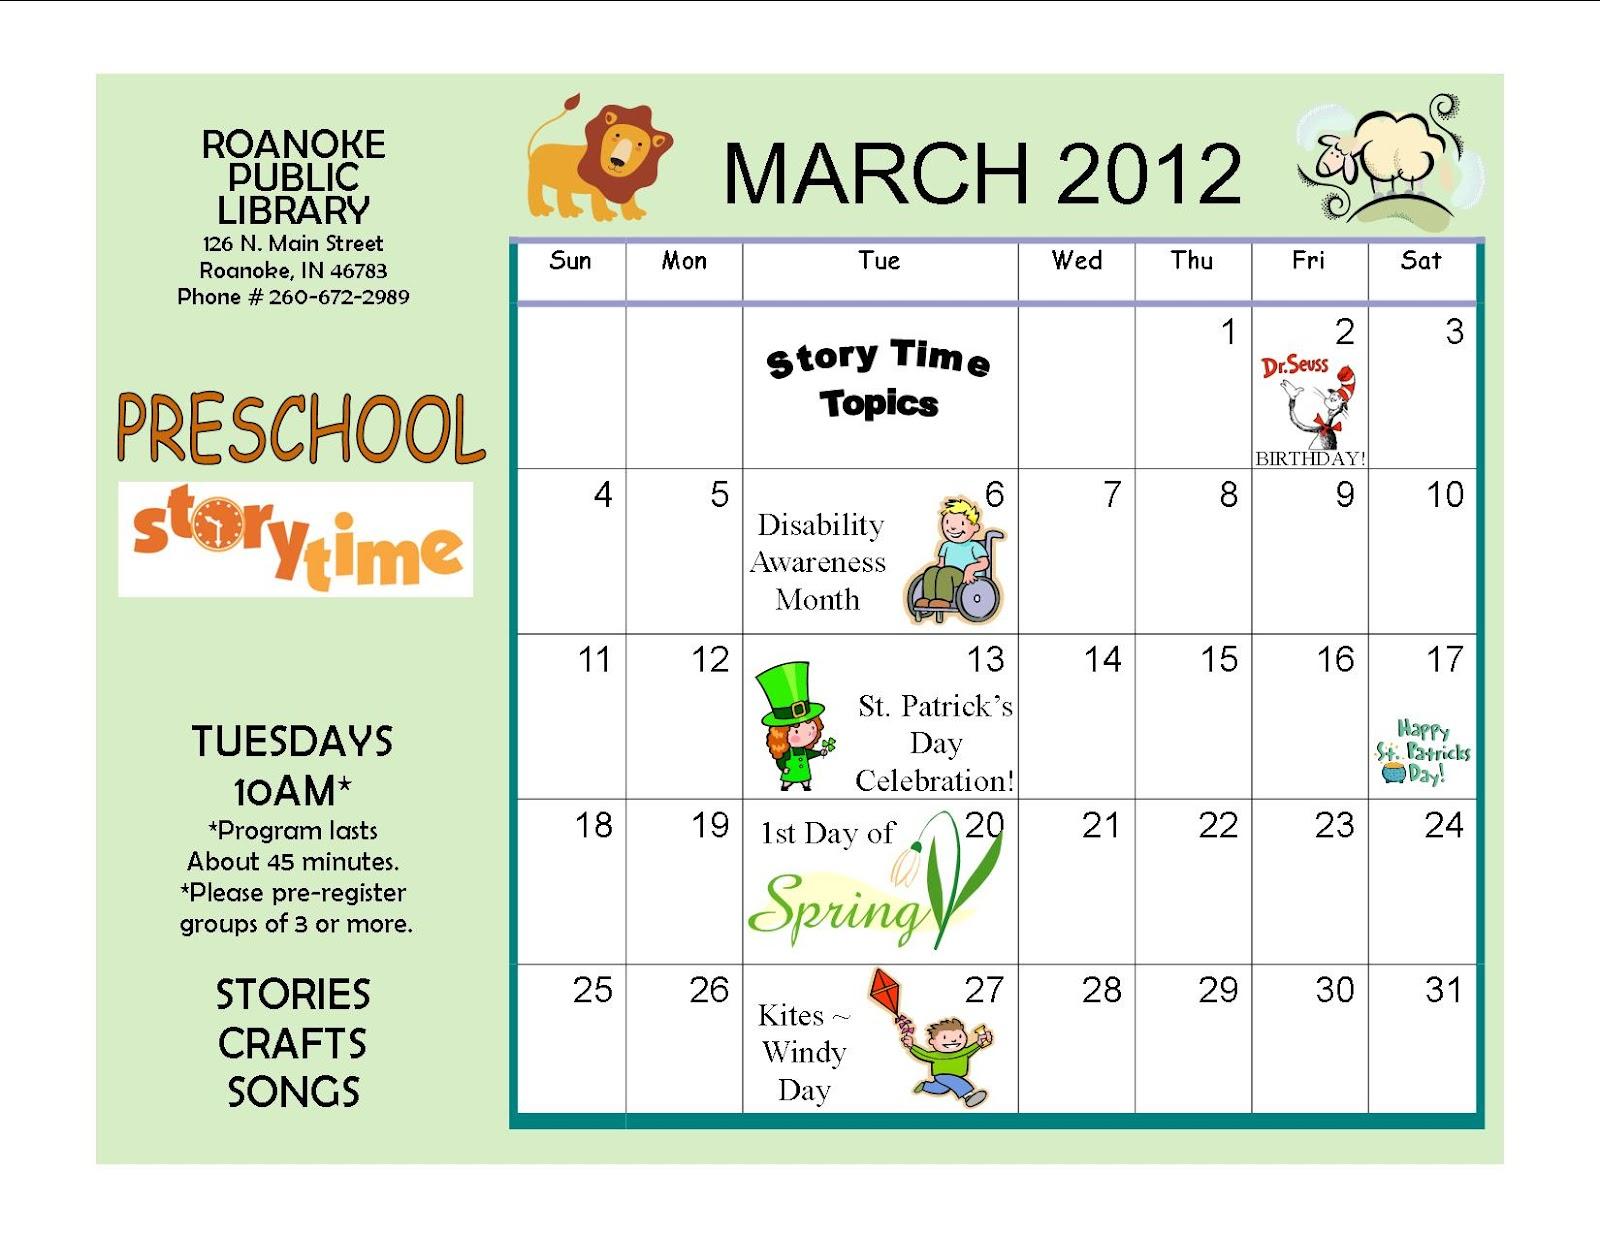 Calendar Ideas For Nursery : Kindergarten calendar on pinterest party invitations ideas